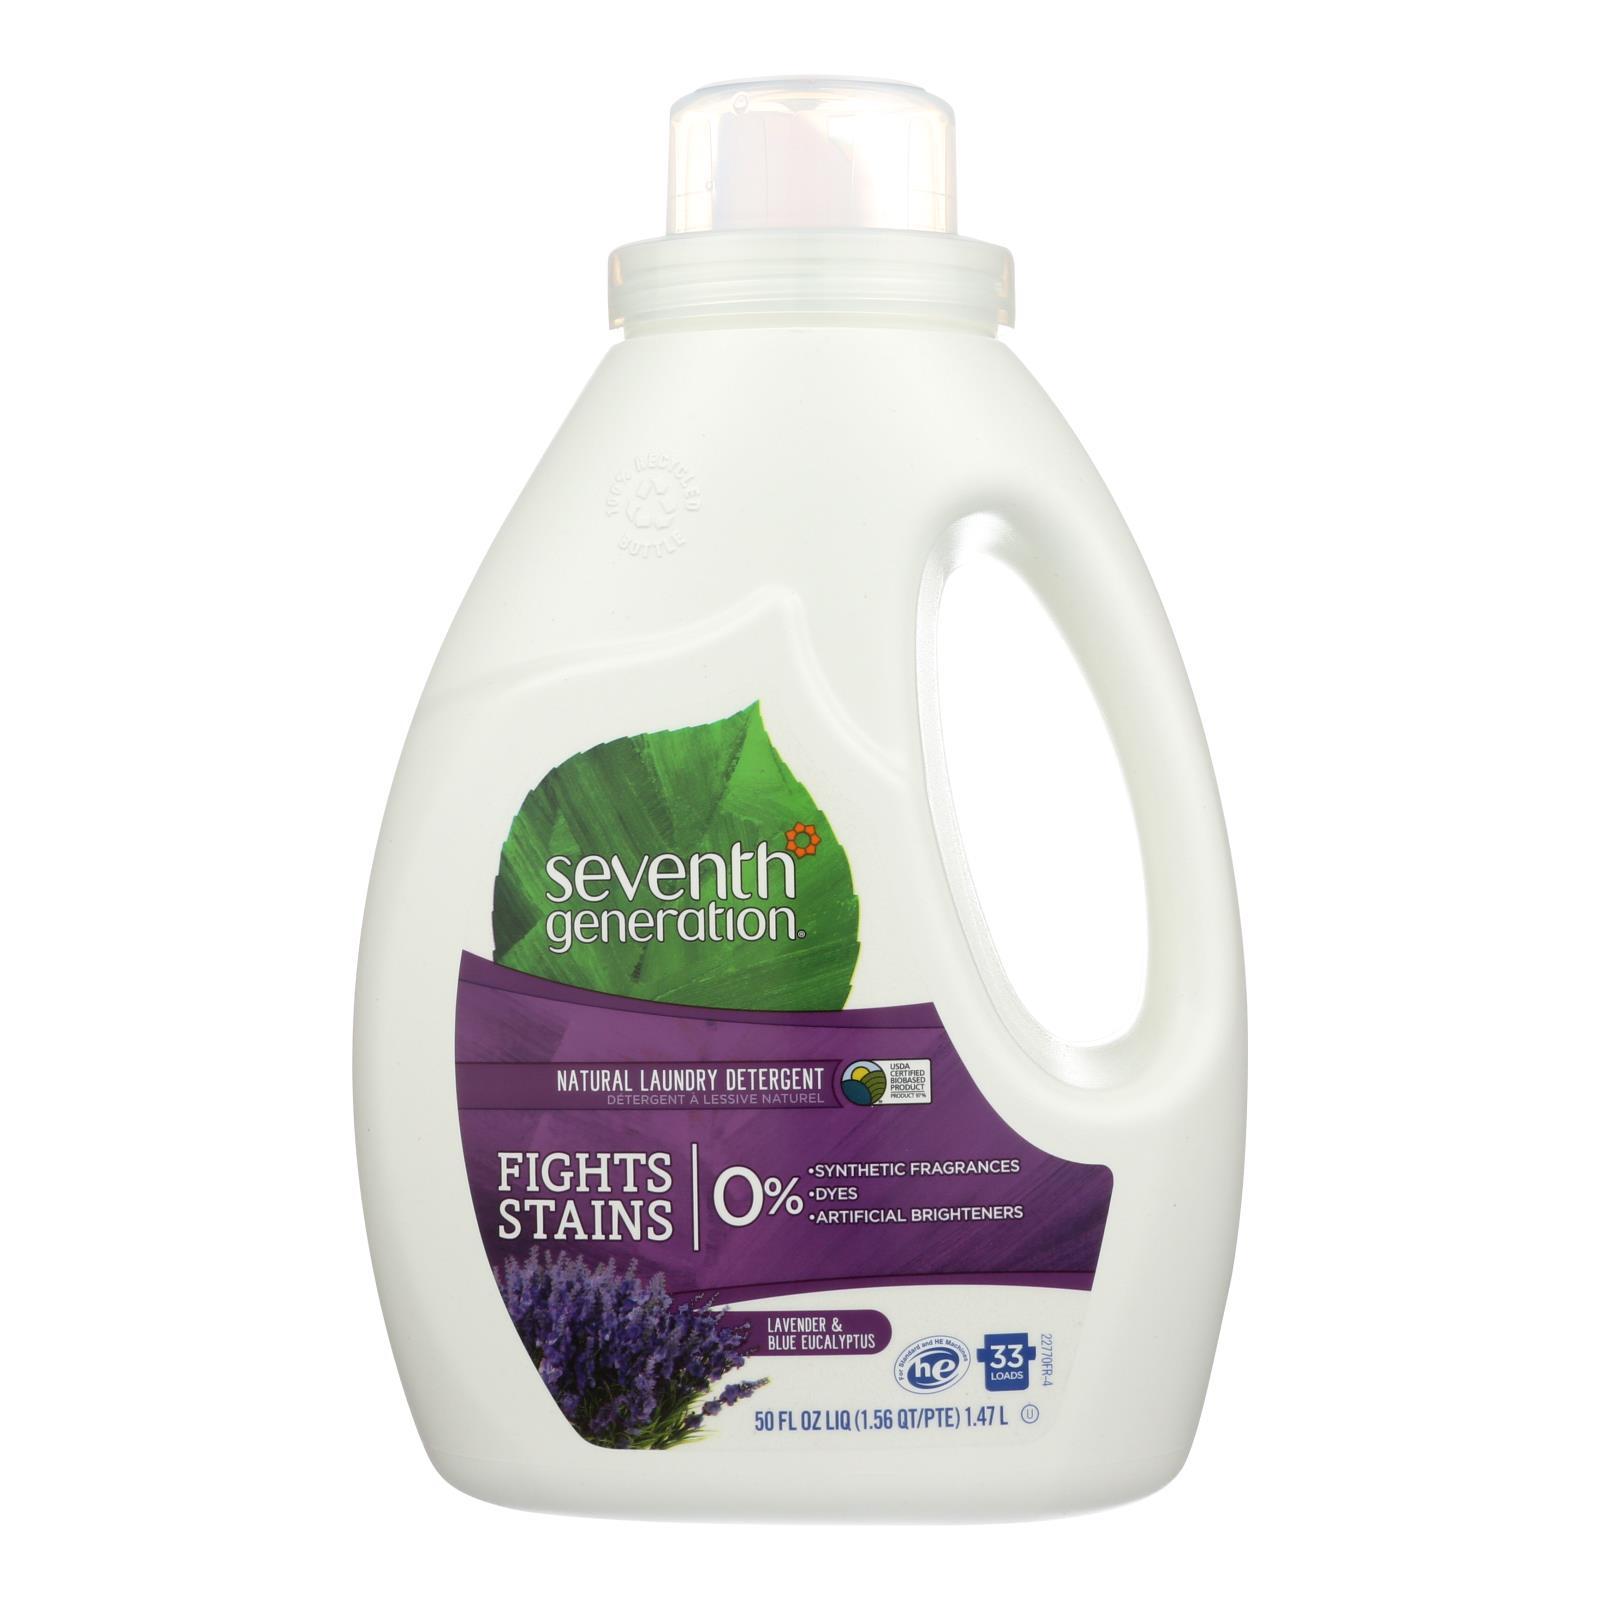 Seventh Generation Natural Laundry Detergent - Blue Eucalyptus and Lavender - Case of 6 - 50 Fl oz.